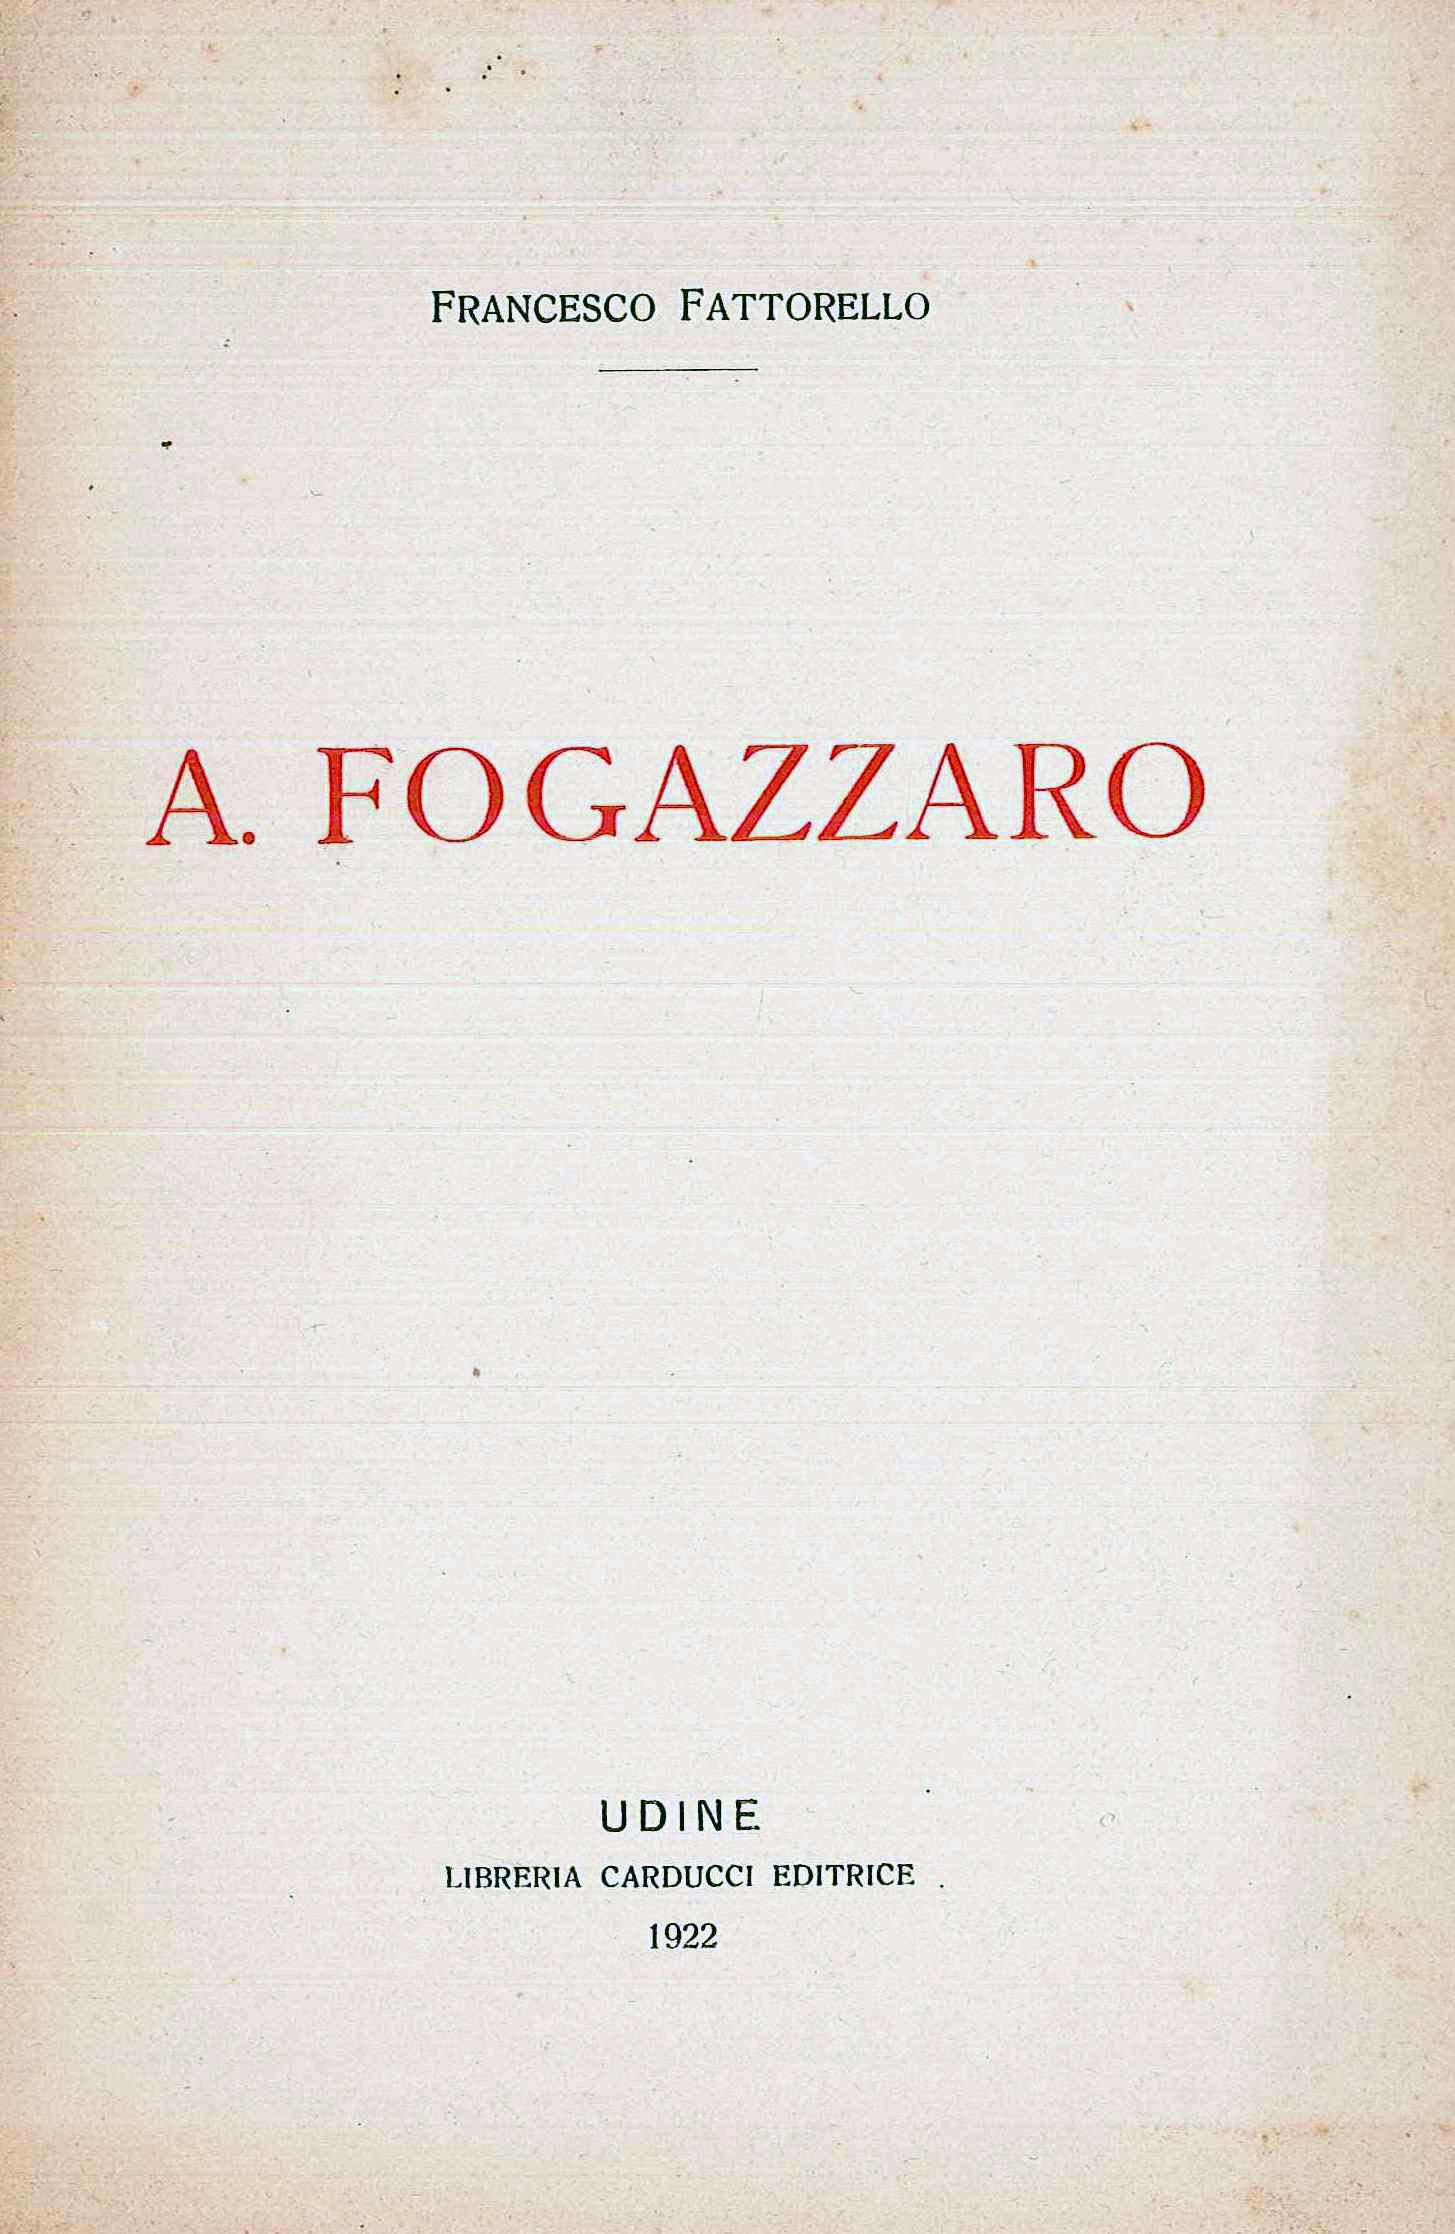 A Fogazzaro (Libreria Carducci - Udine 1922)